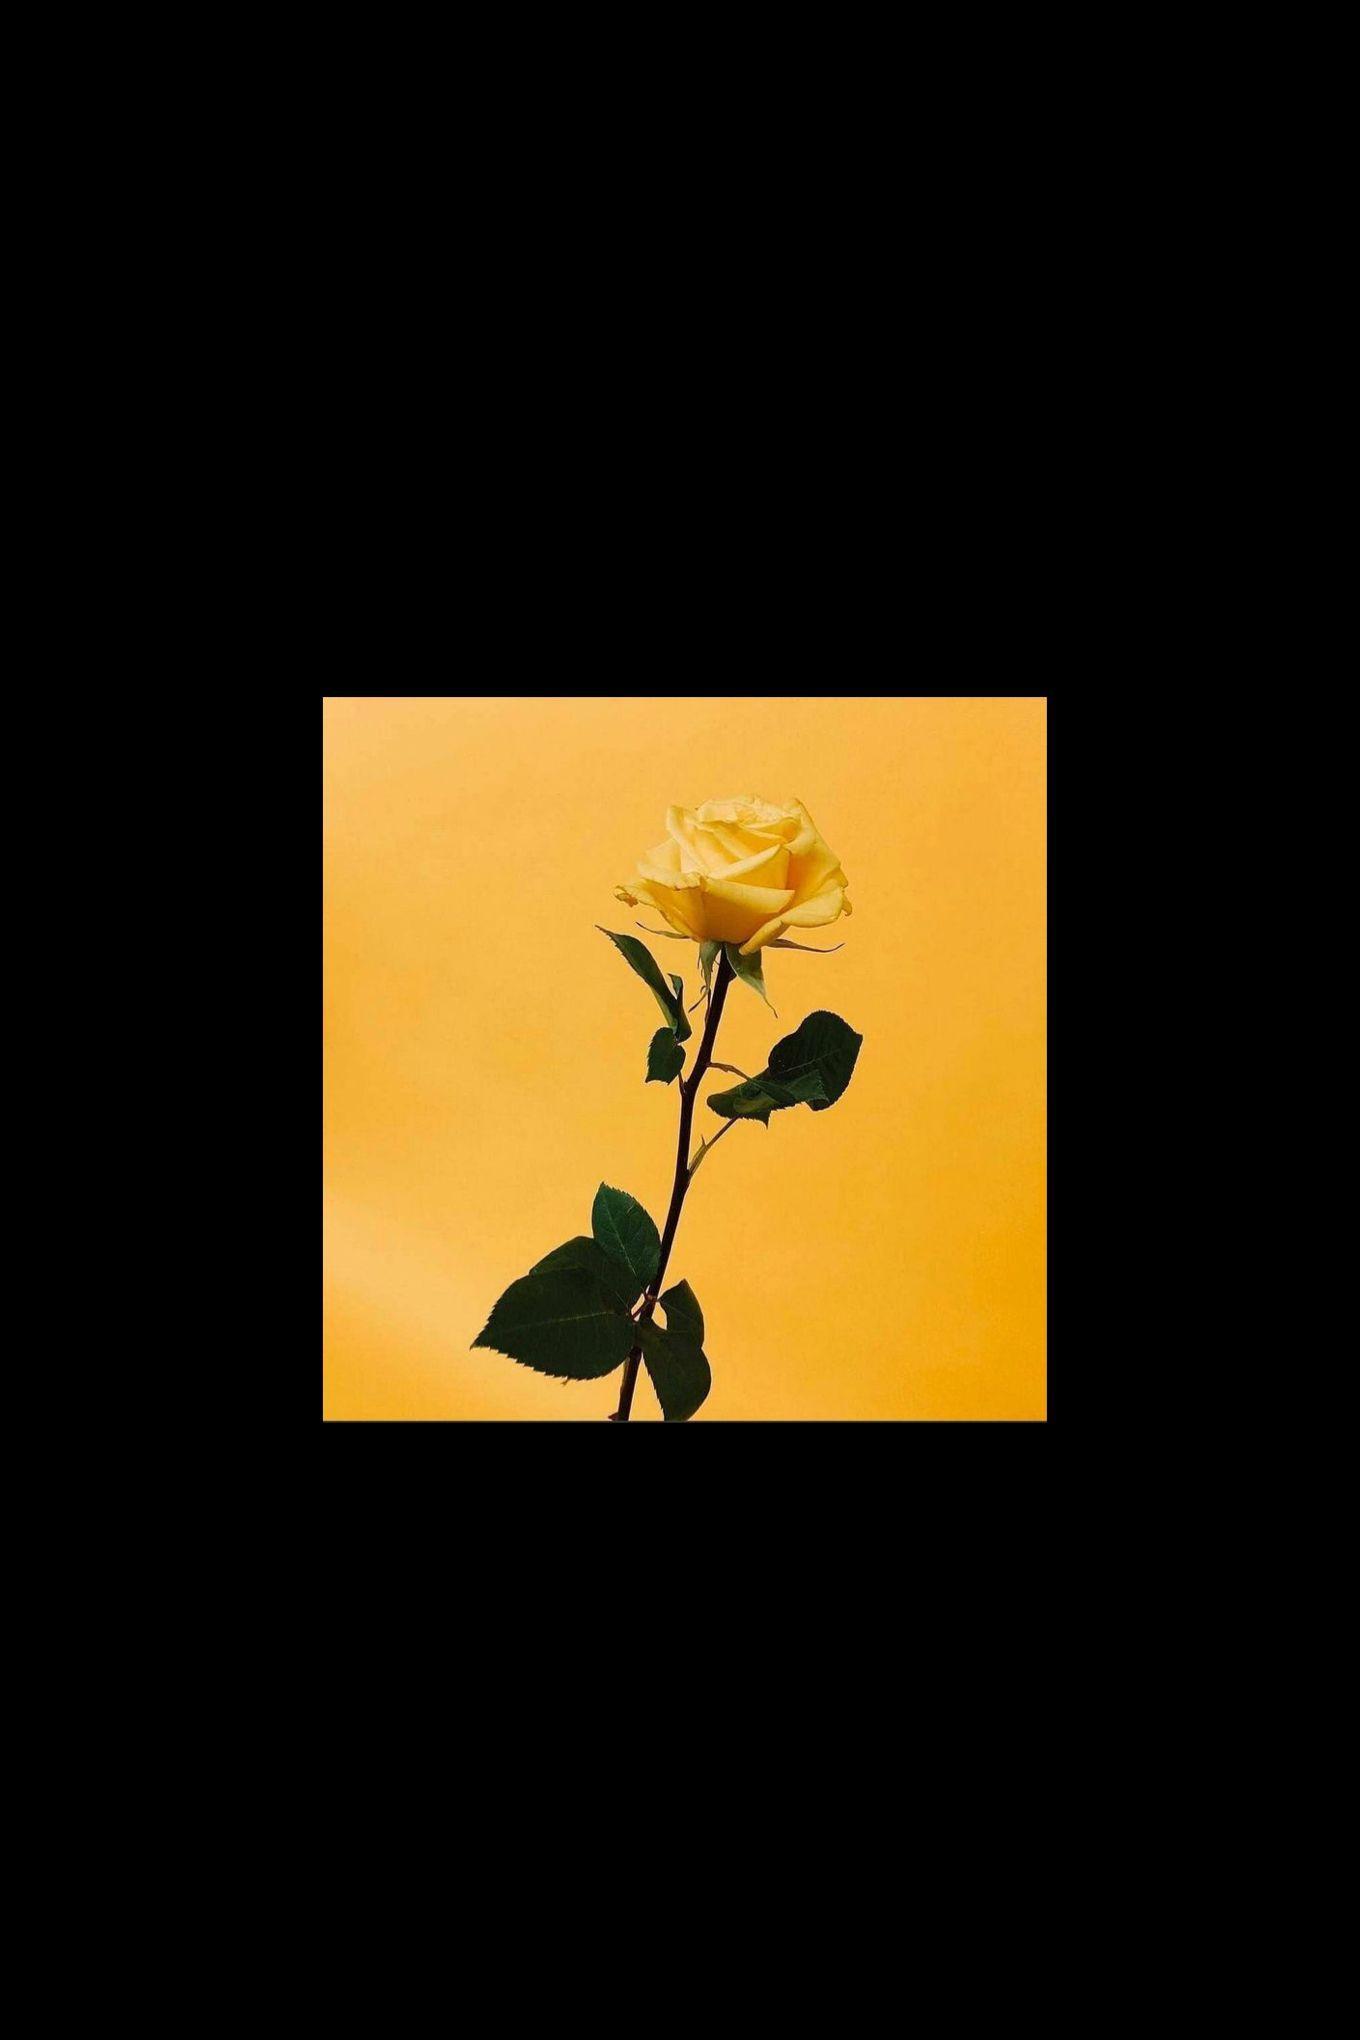 Korean Aesthetic Yellow Wallpapers Top Free Korean Aesthetic Yellow Backgrounds Wallpaperaccess